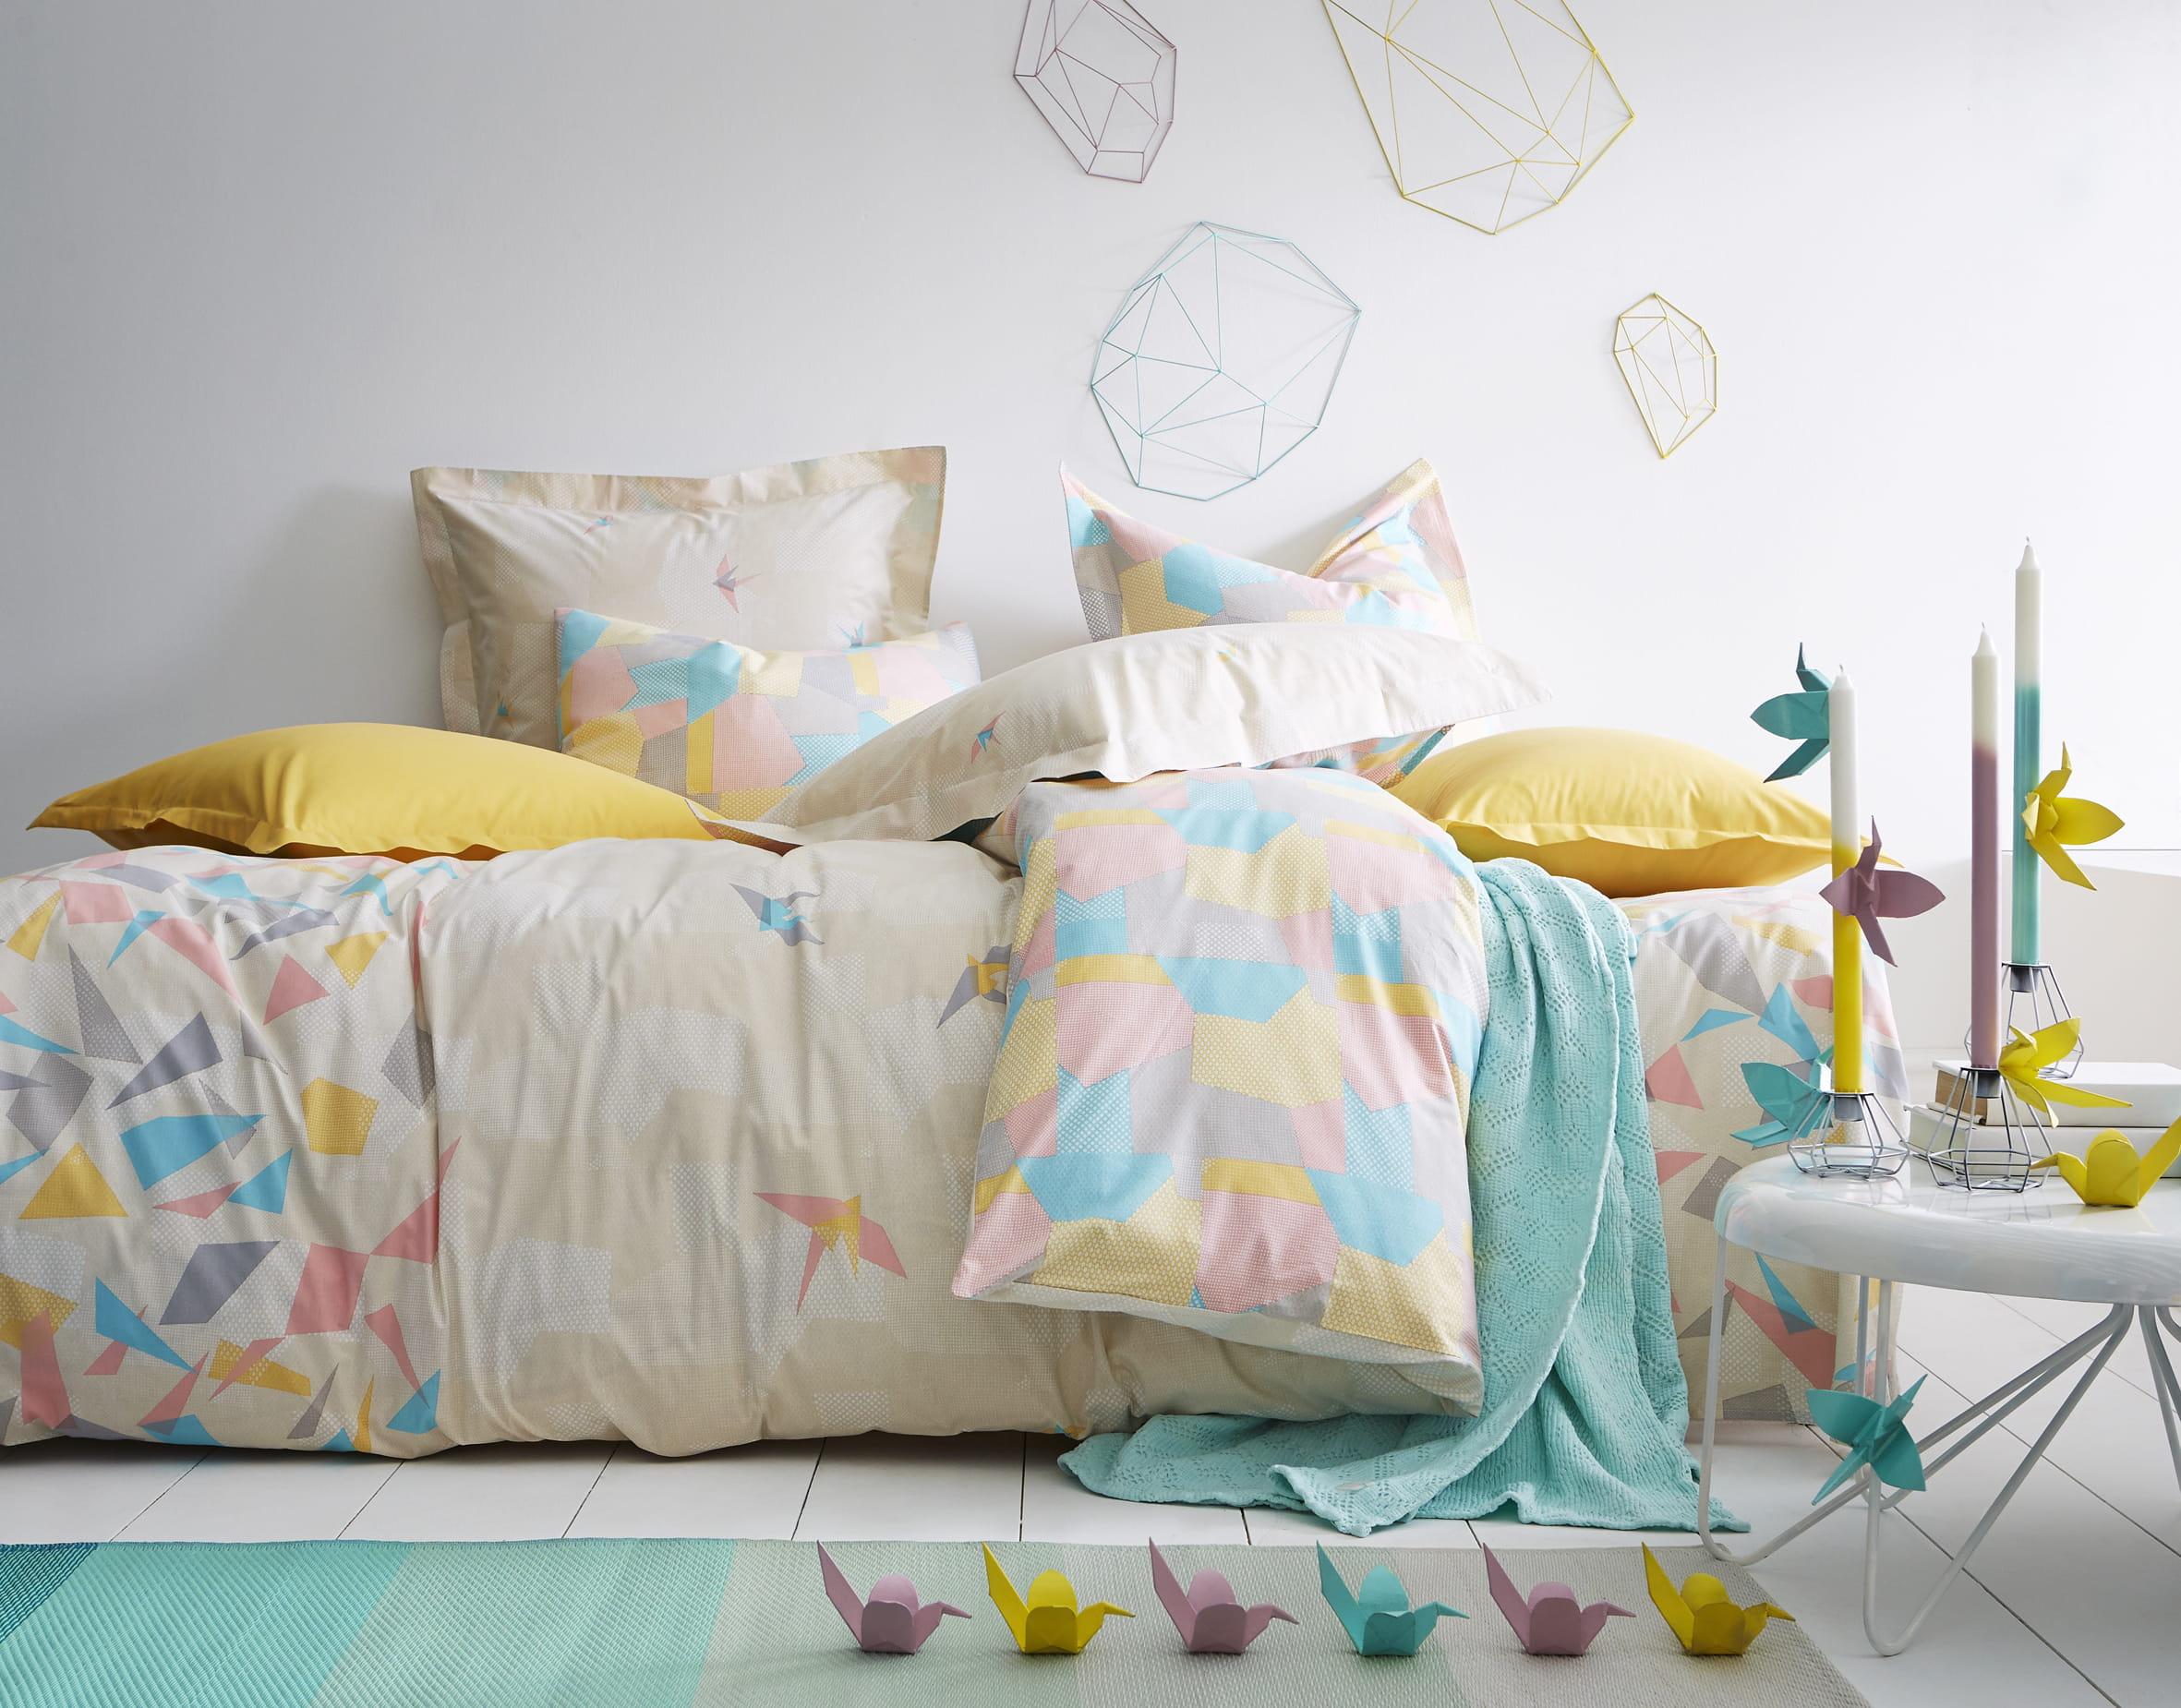 linge de lit origami d 39 essix home linge de lit a sent le printemps journal des femmes. Black Bedroom Furniture Sets. Home Design Ideas